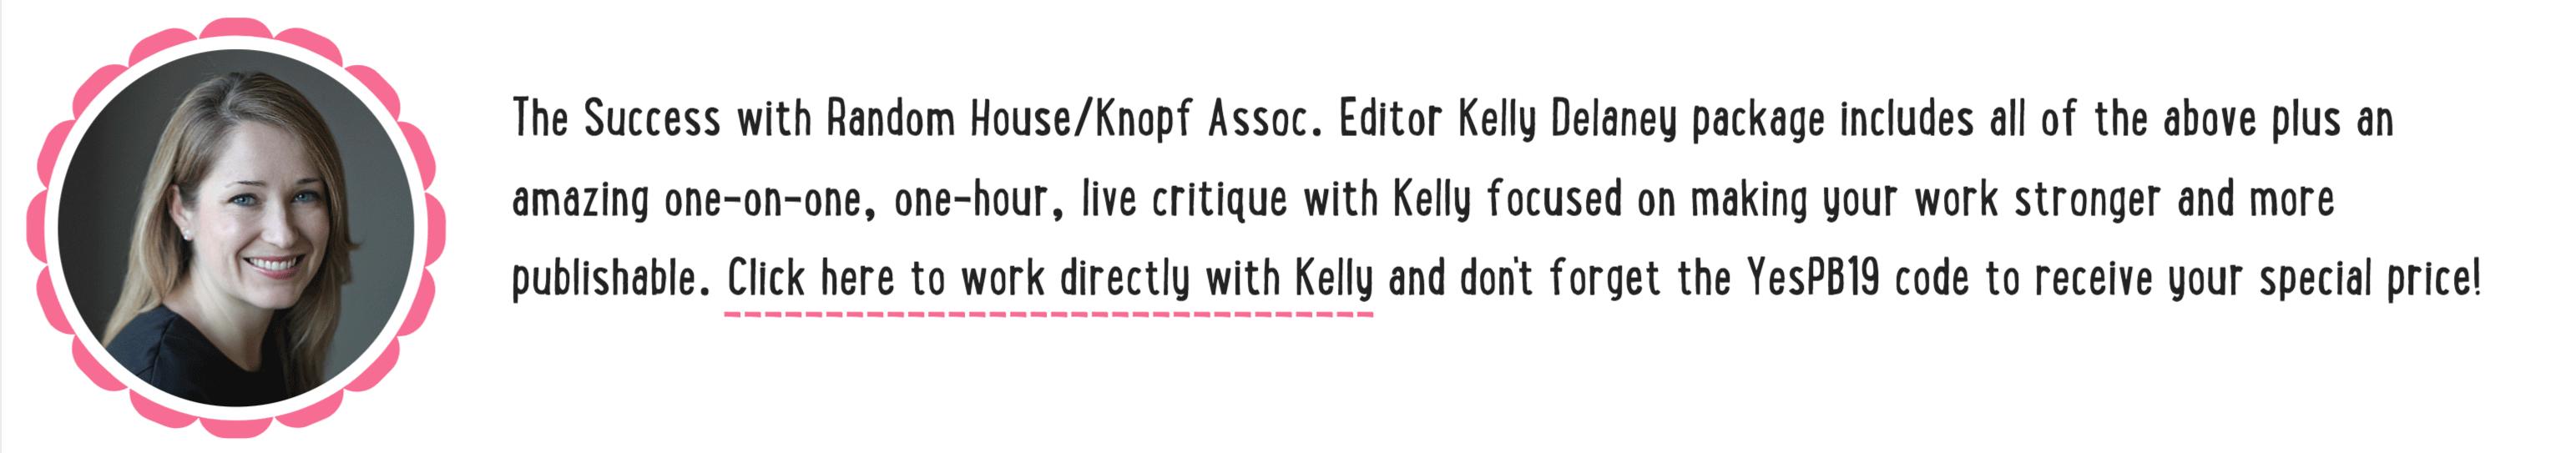 The Big Bonus Plus Success with Kelly